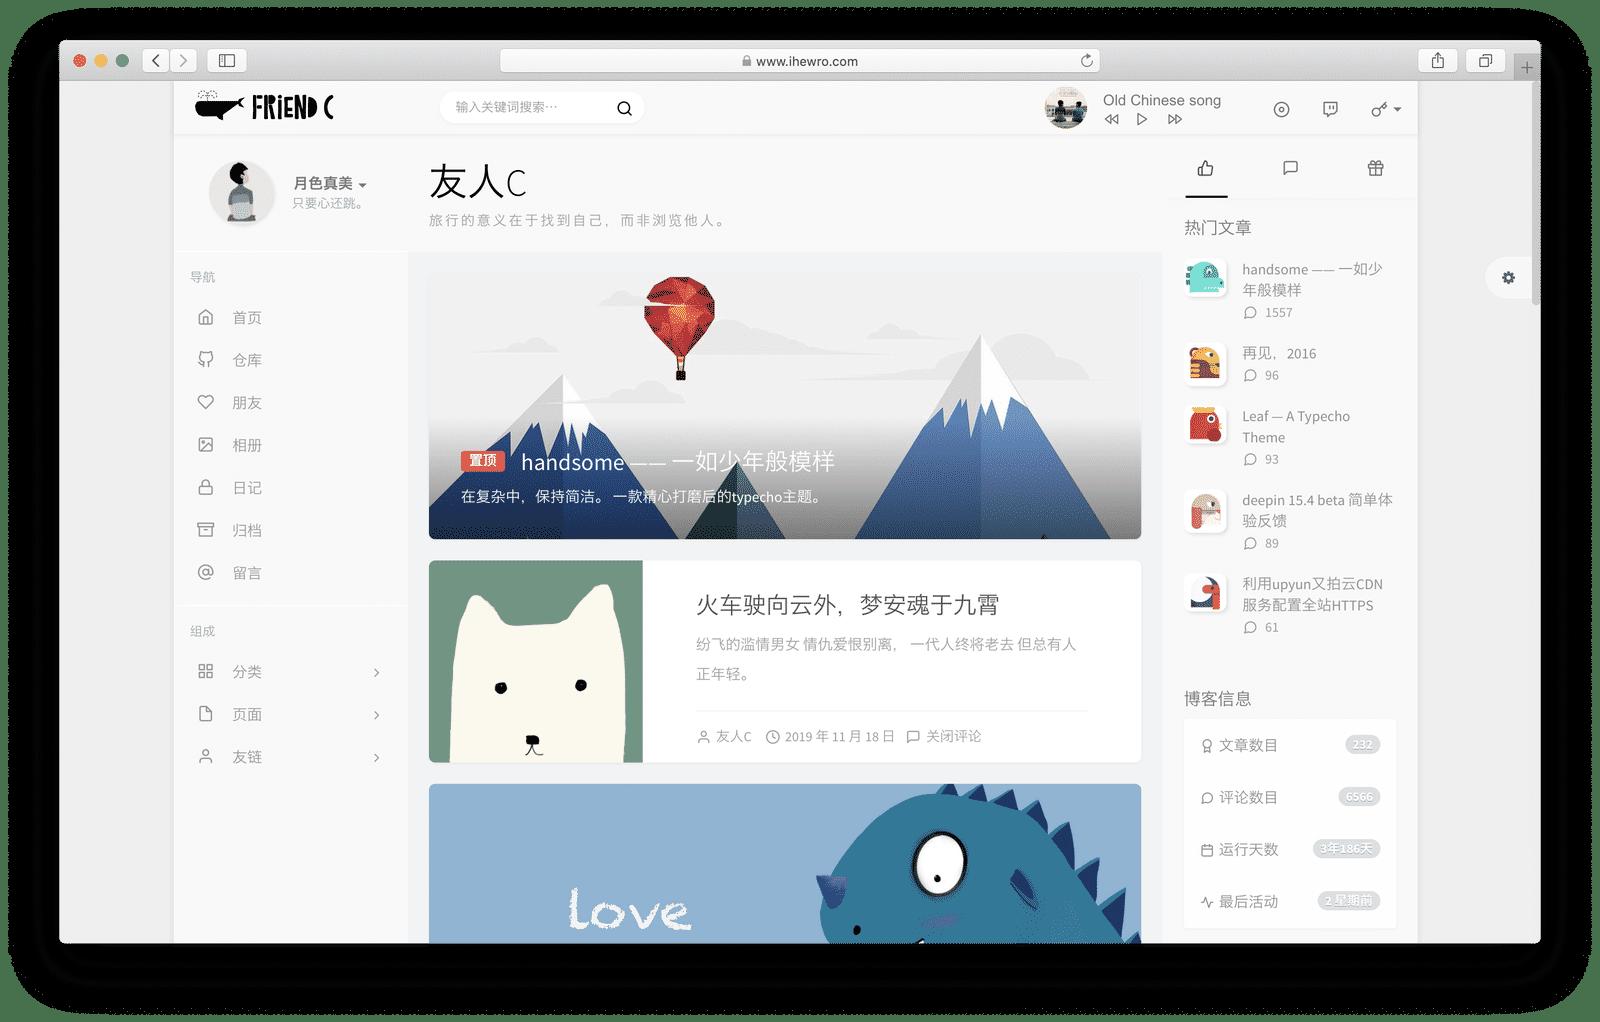 Typecho博客主题Handsome6.0全解密 第1张